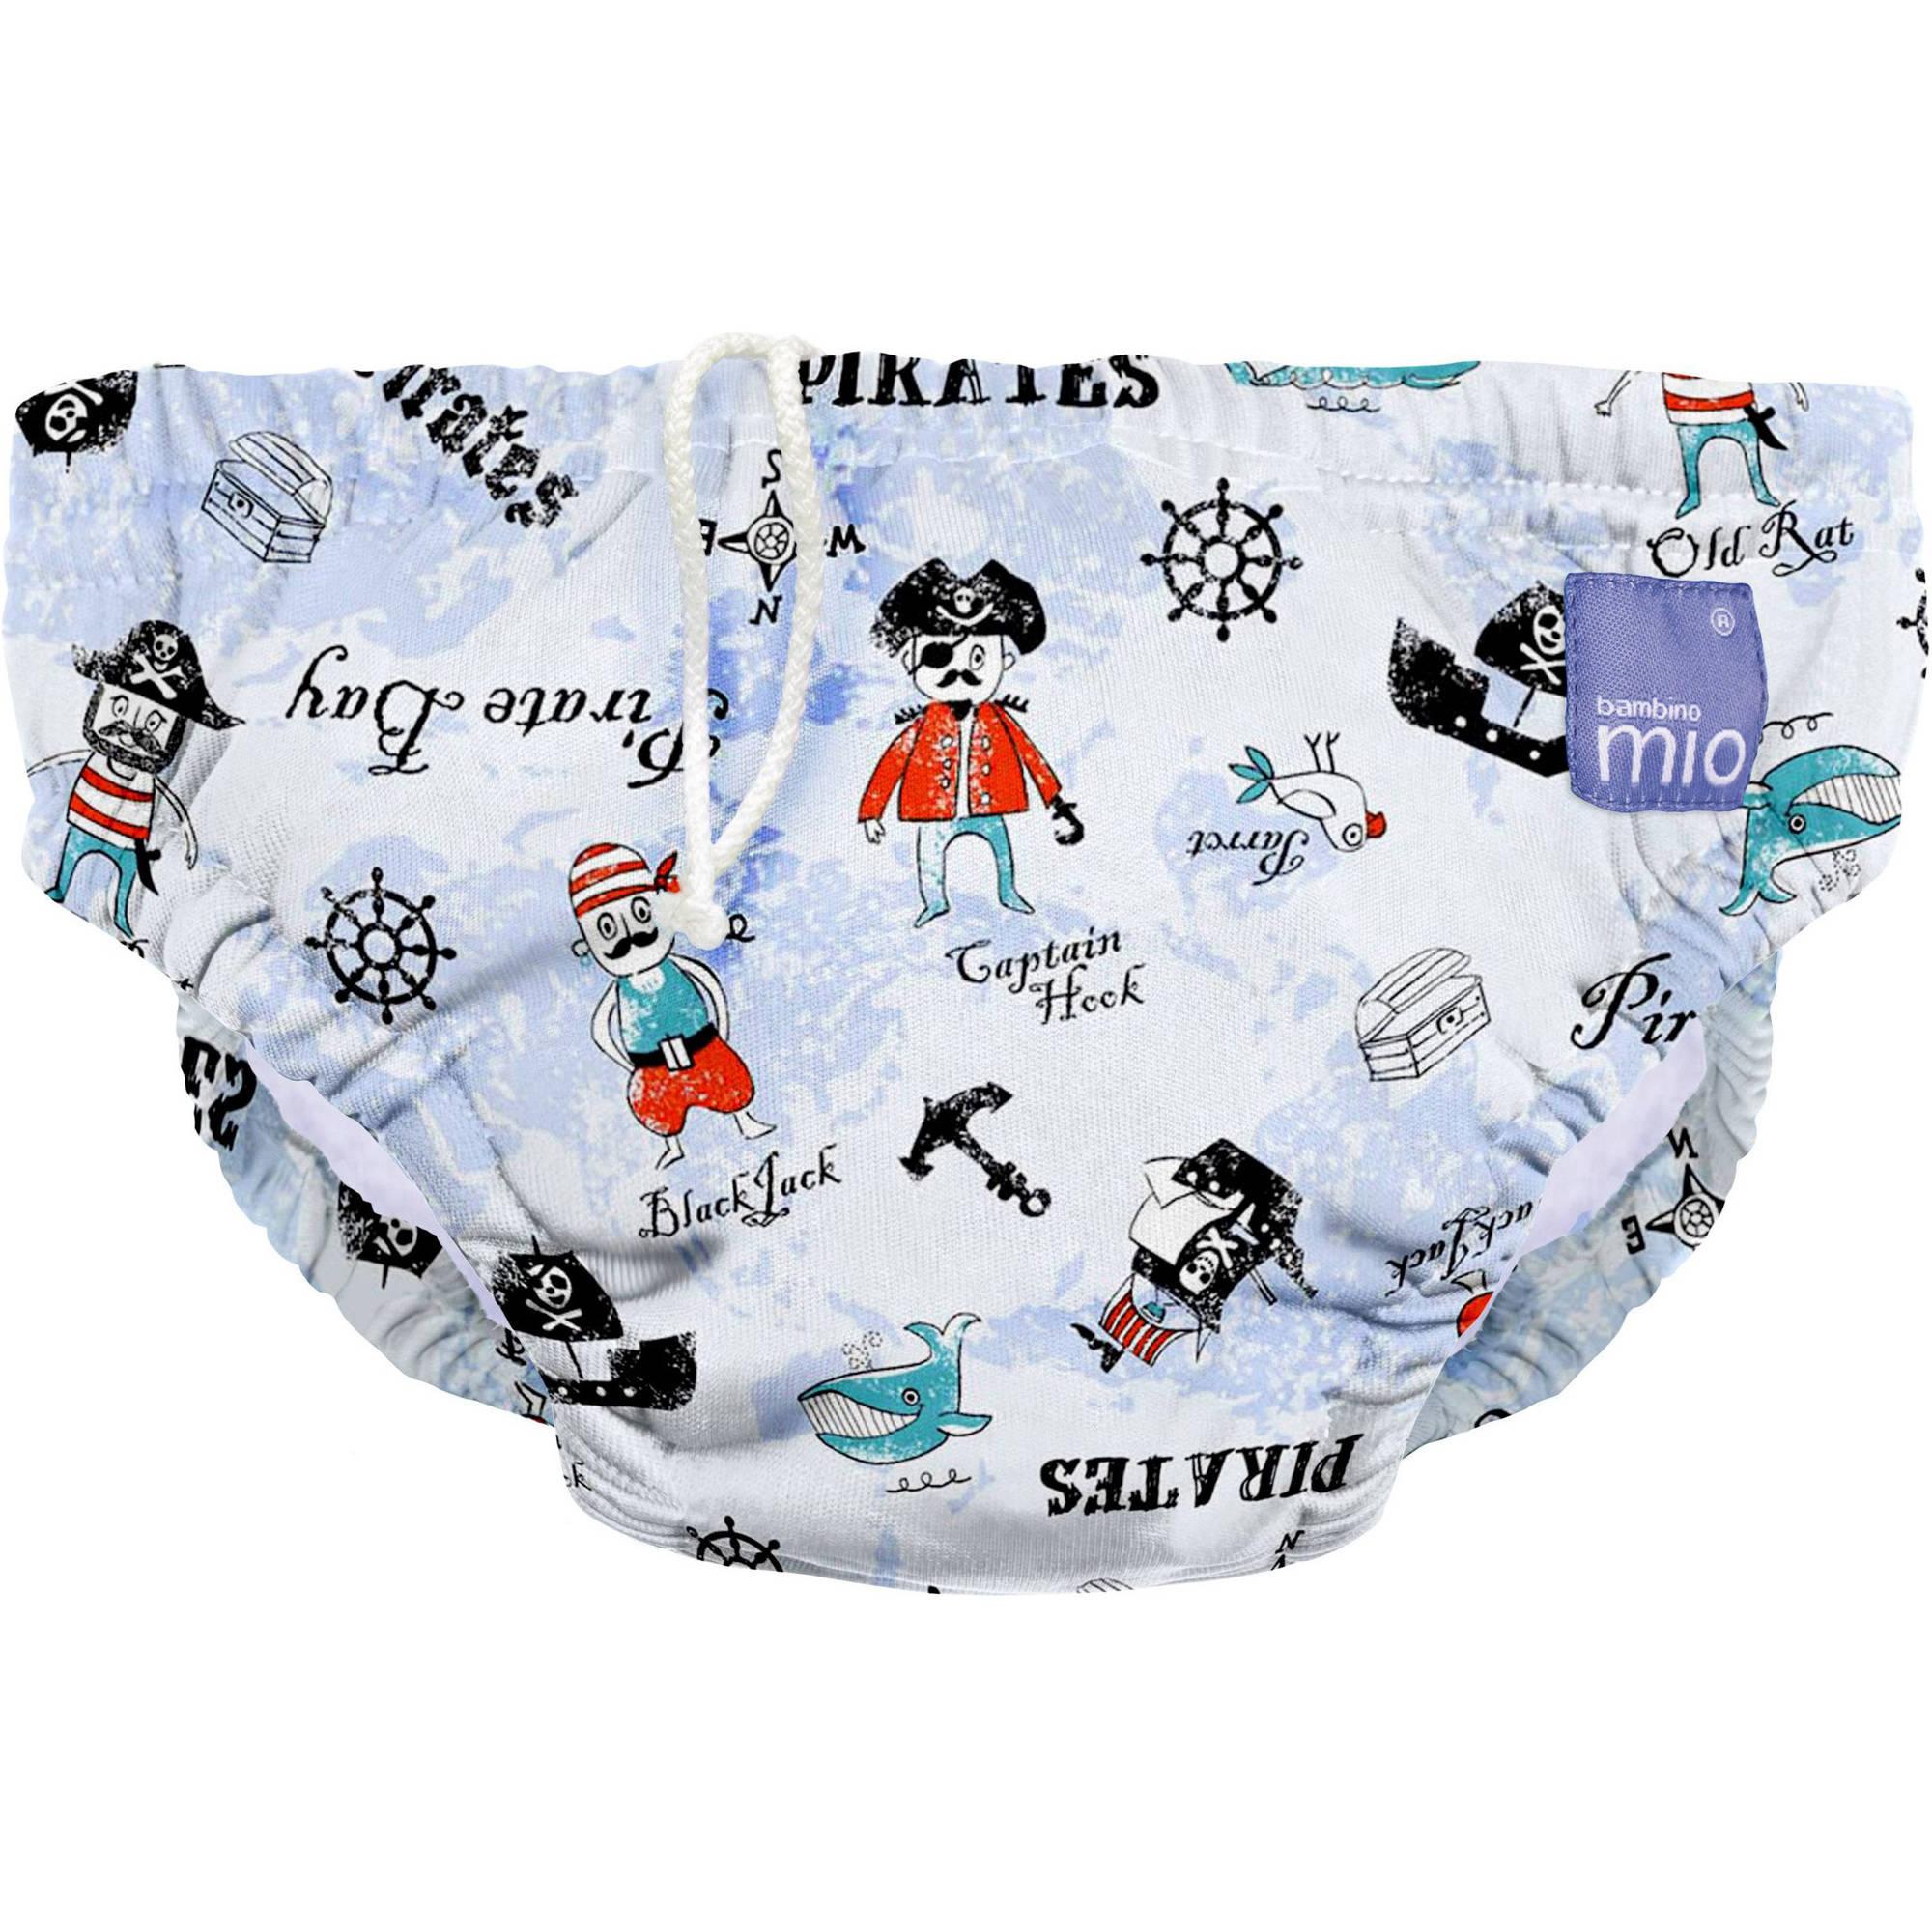 Bambino Mio Reusable Swim Diaper, Pirate Bay, (Choose Your Size)